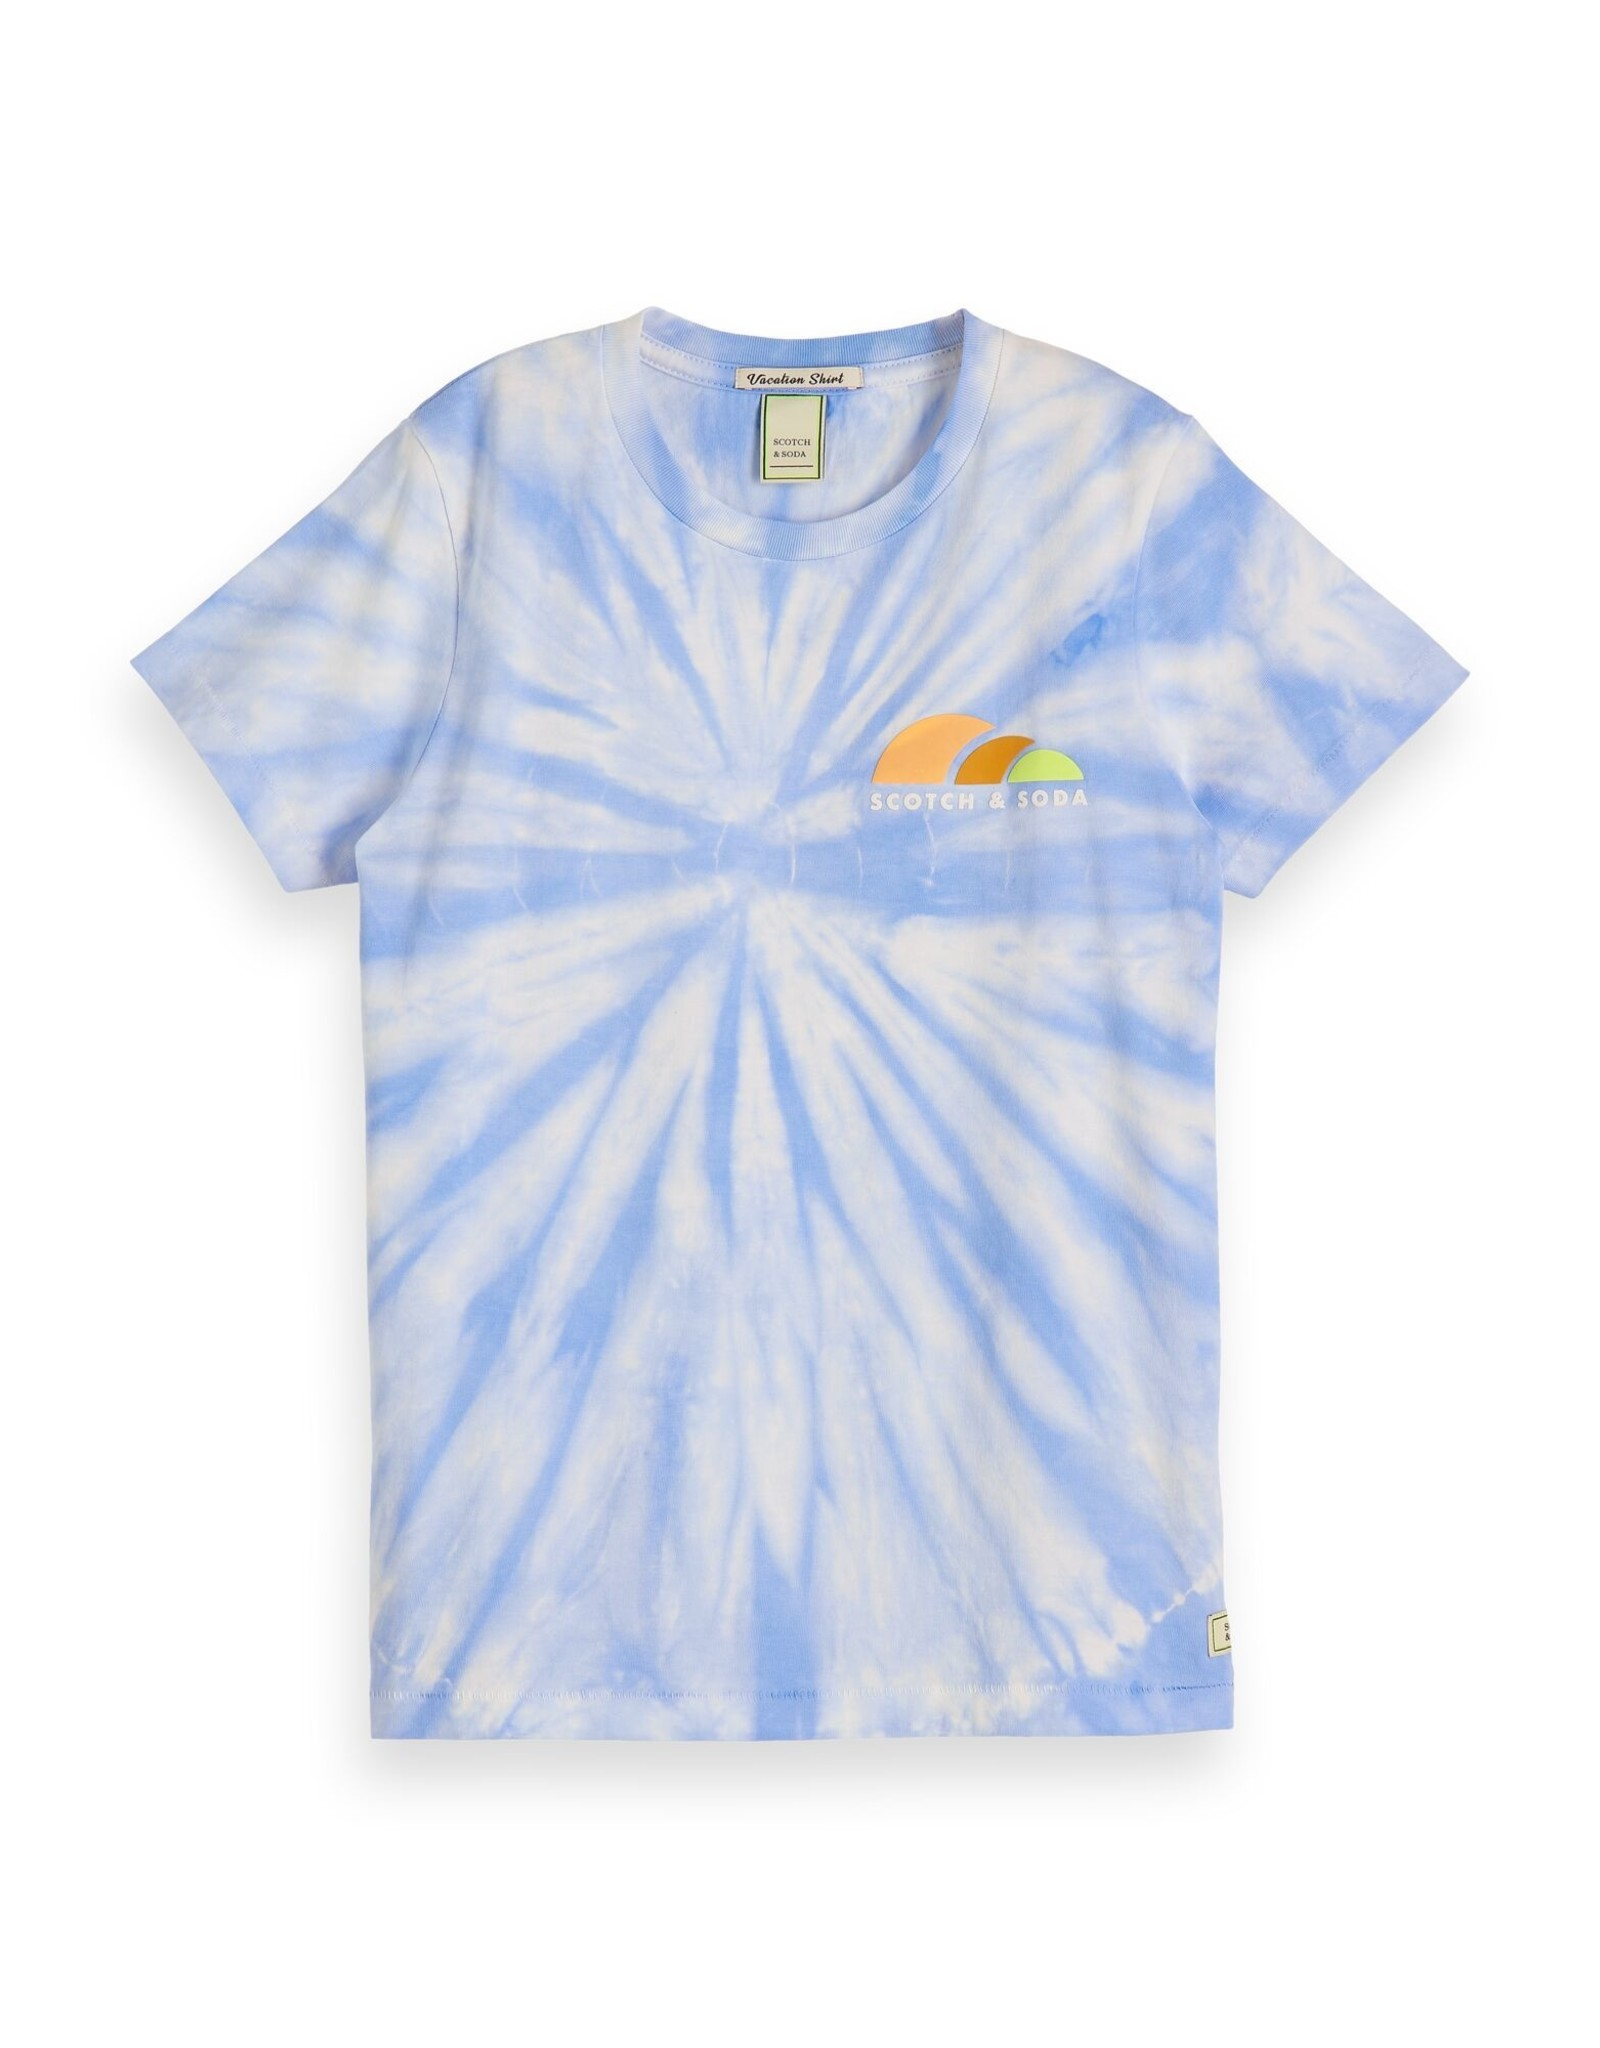 Scotch&Soda Shrunk tie dye t-shirt